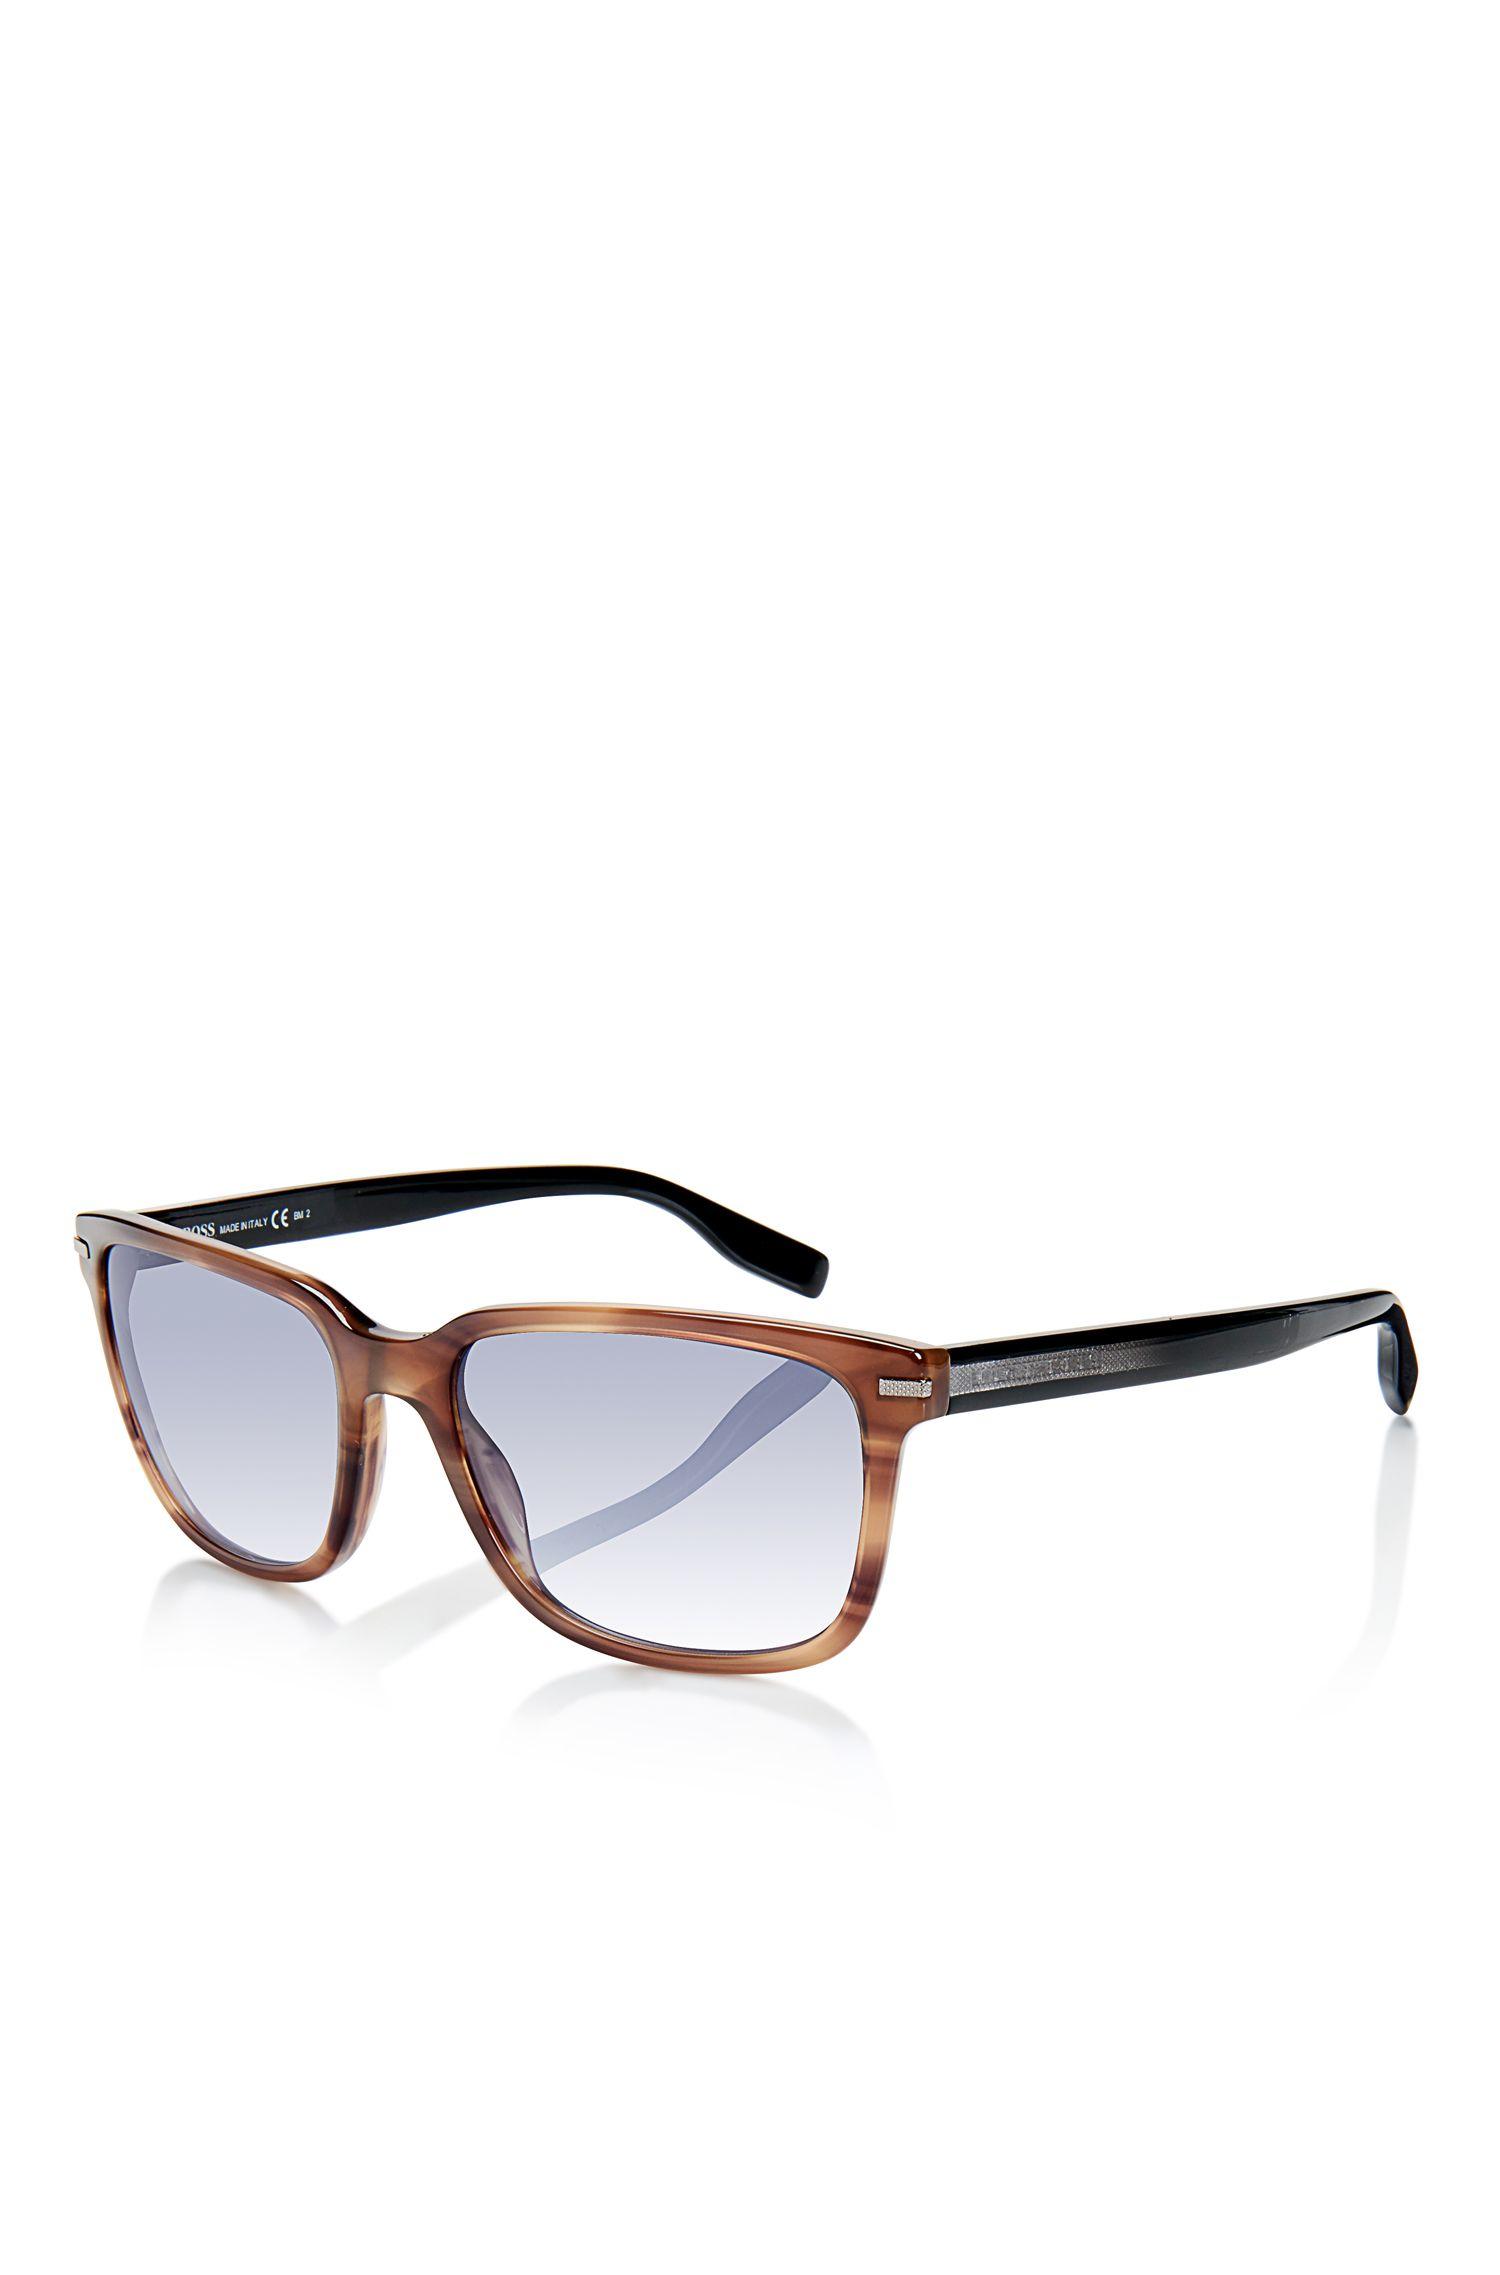 Grey Gradient Lens Sunglasses | BOSS 0623/S, Assorted-Pre-Pack